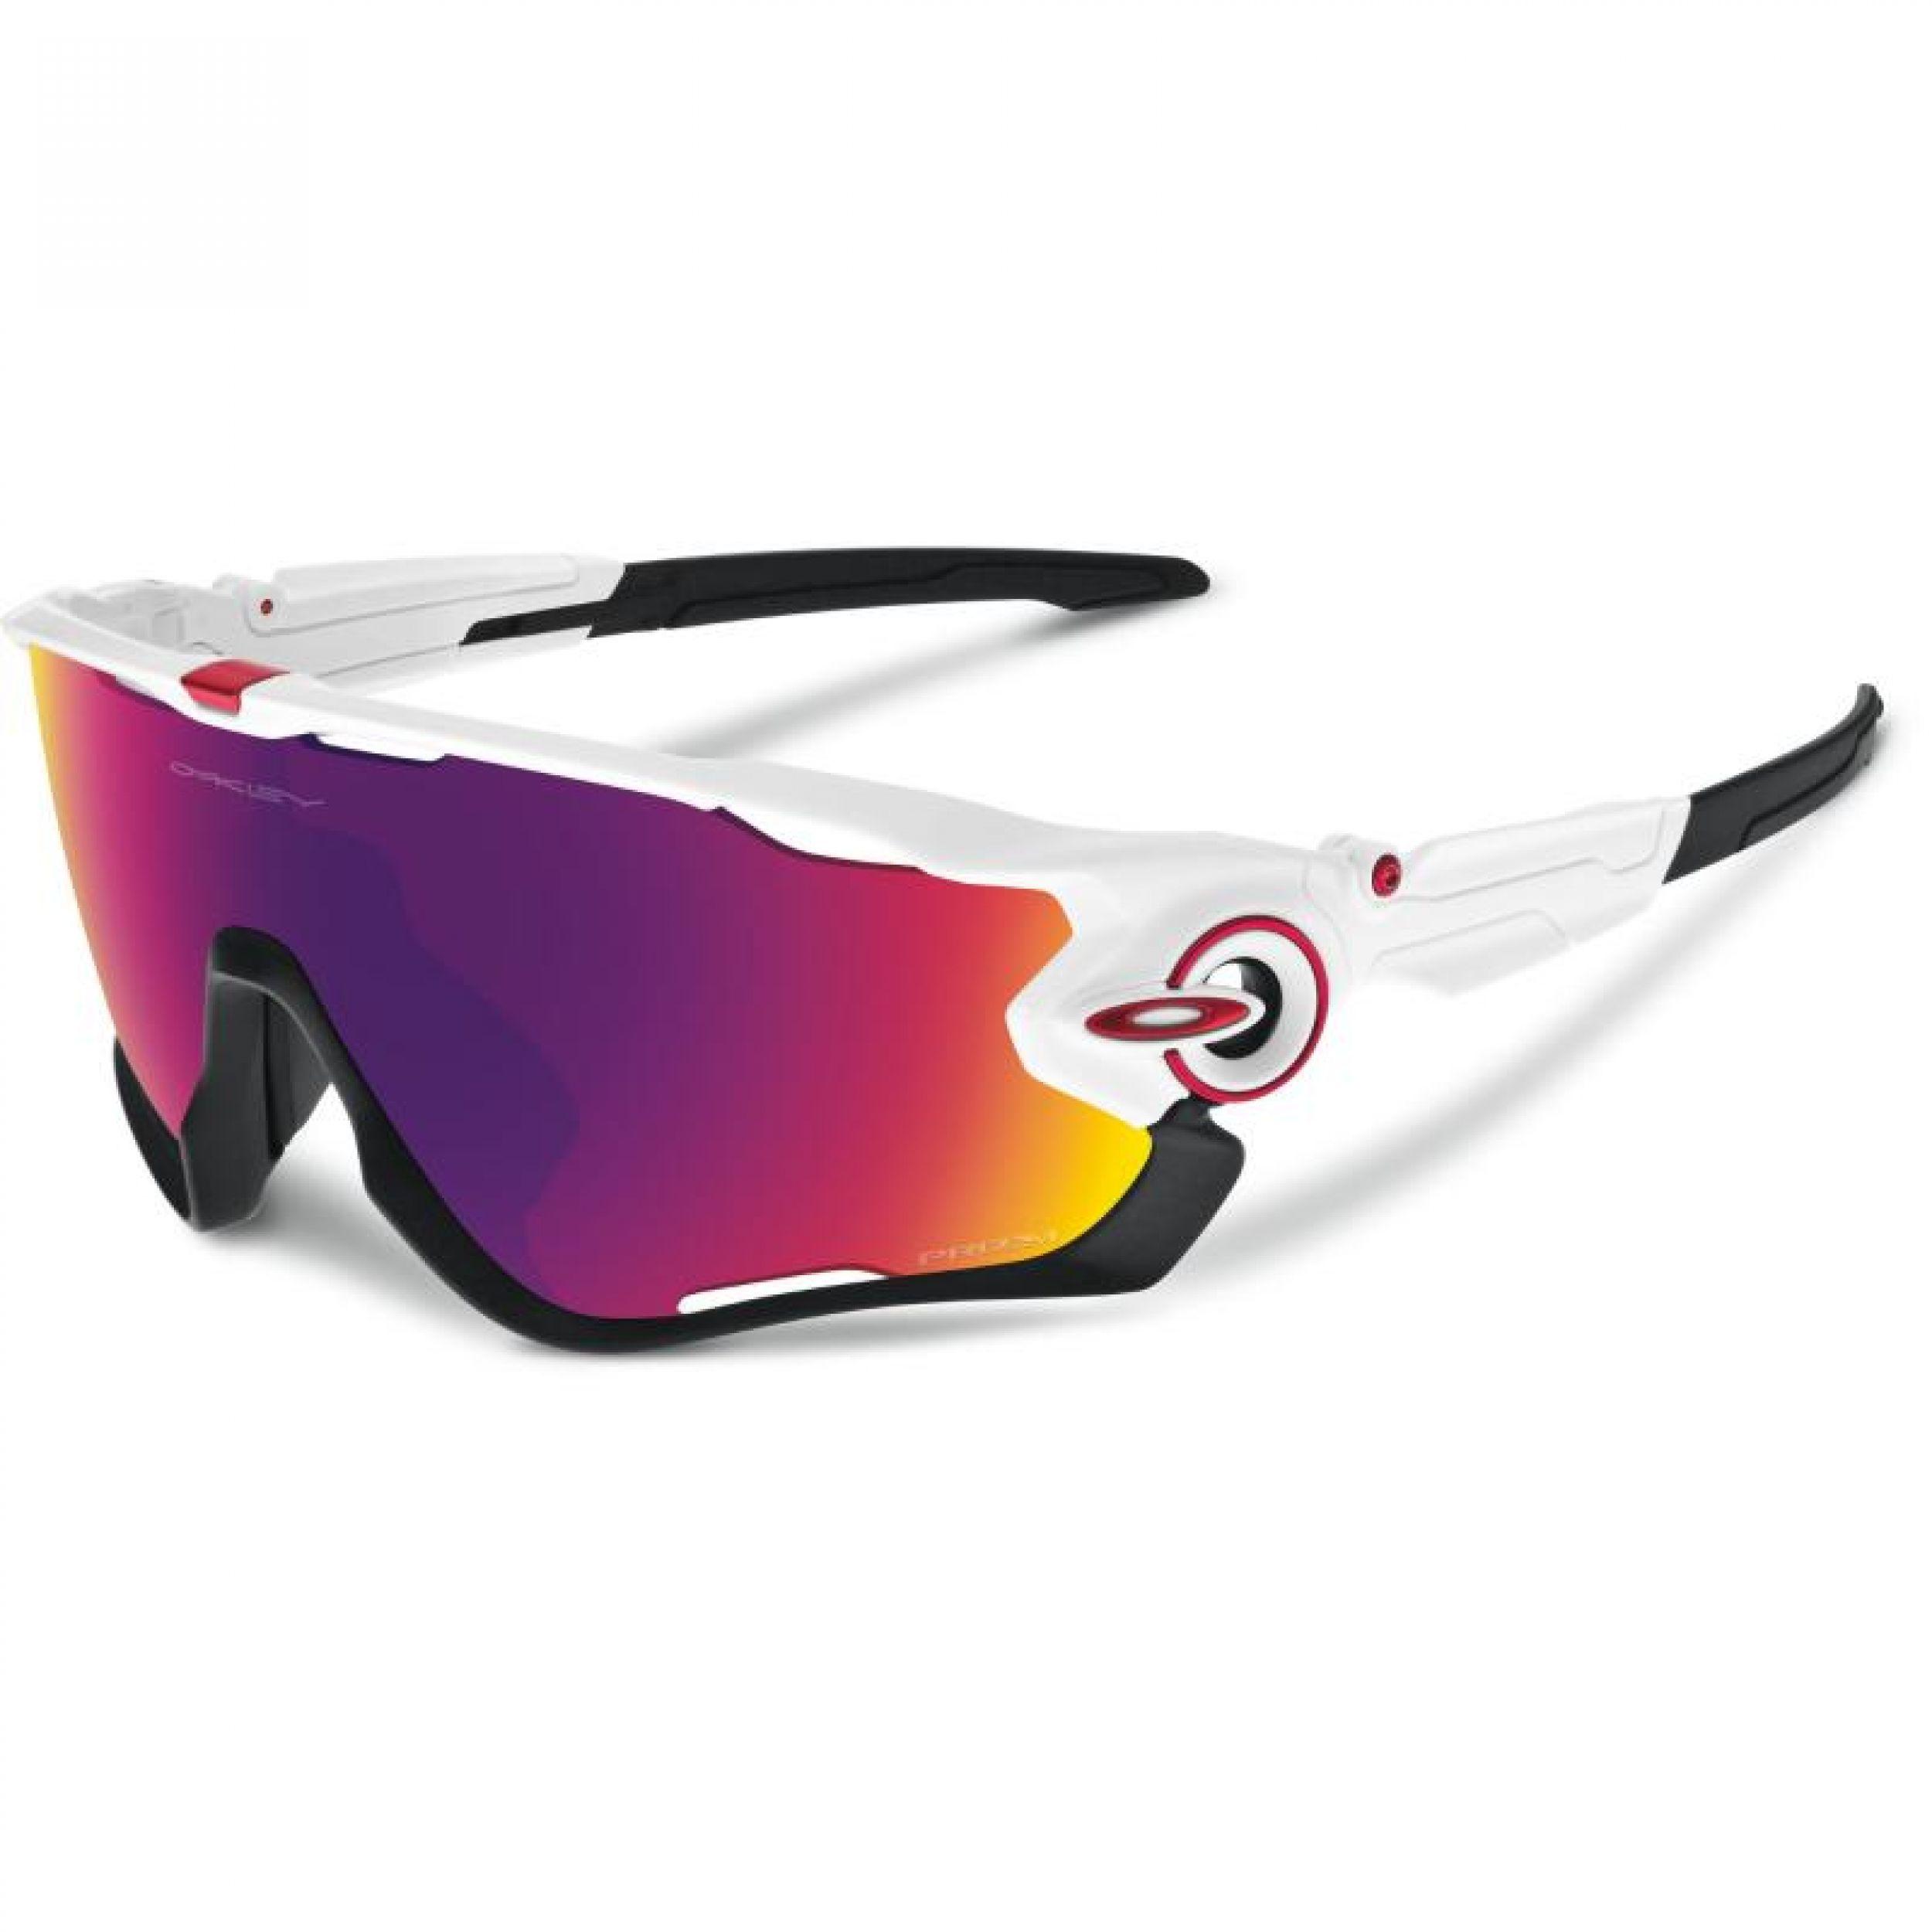 Oakley-Jawbreaker-Prizm-Road-Sunglasses-Performance-Sunglasses-Polished-White-2015-OO9290-05_2.jpg